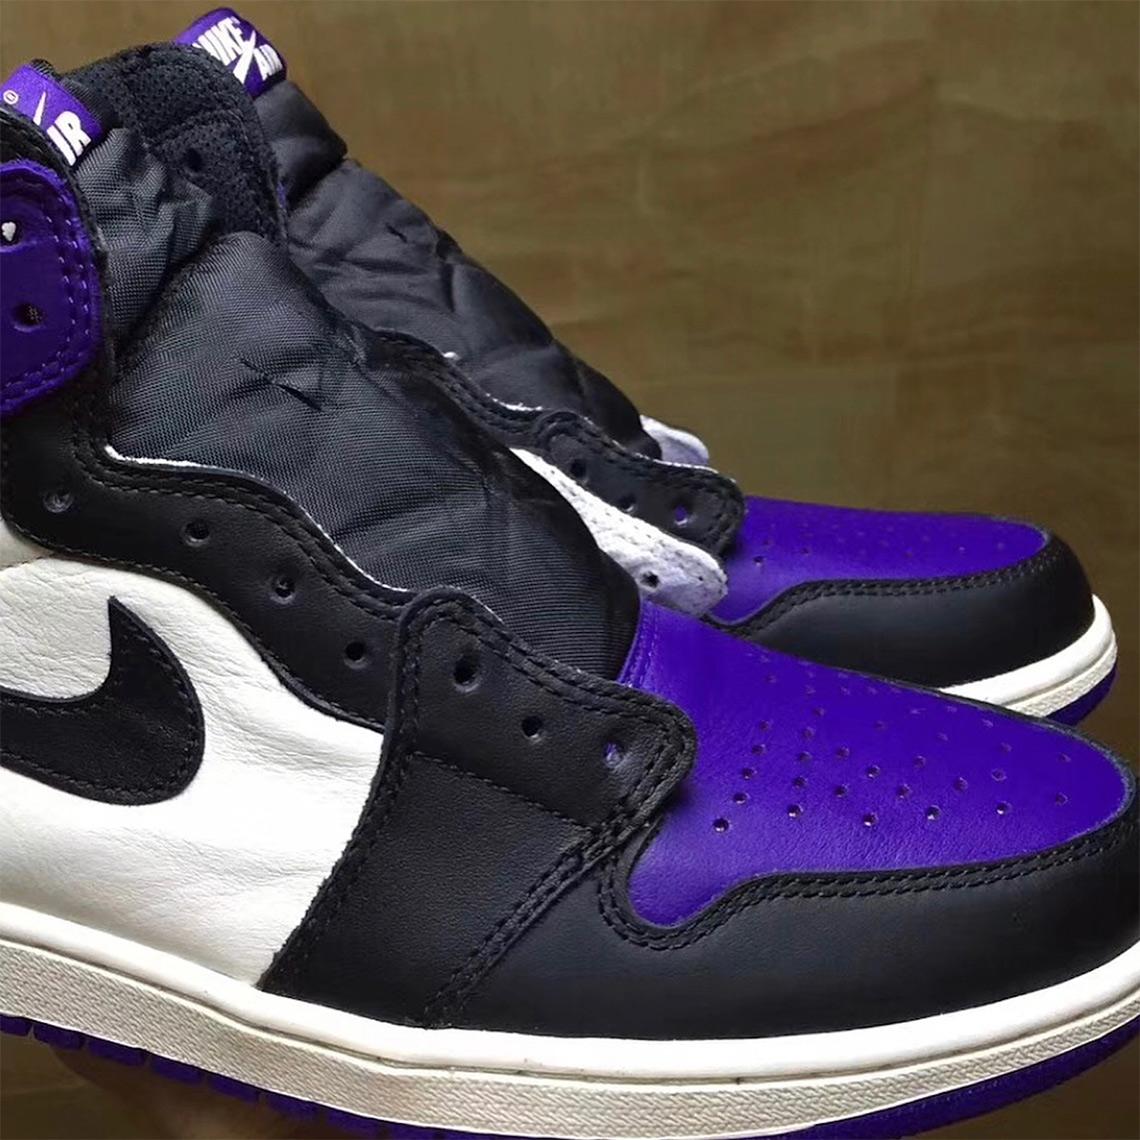 04b50fff49cd wholesale air jordan 1 phat black stealth court purple 0ead5 d3e65   switzerland air jordan 1 retro high og release date september 22 2018 160.  color court